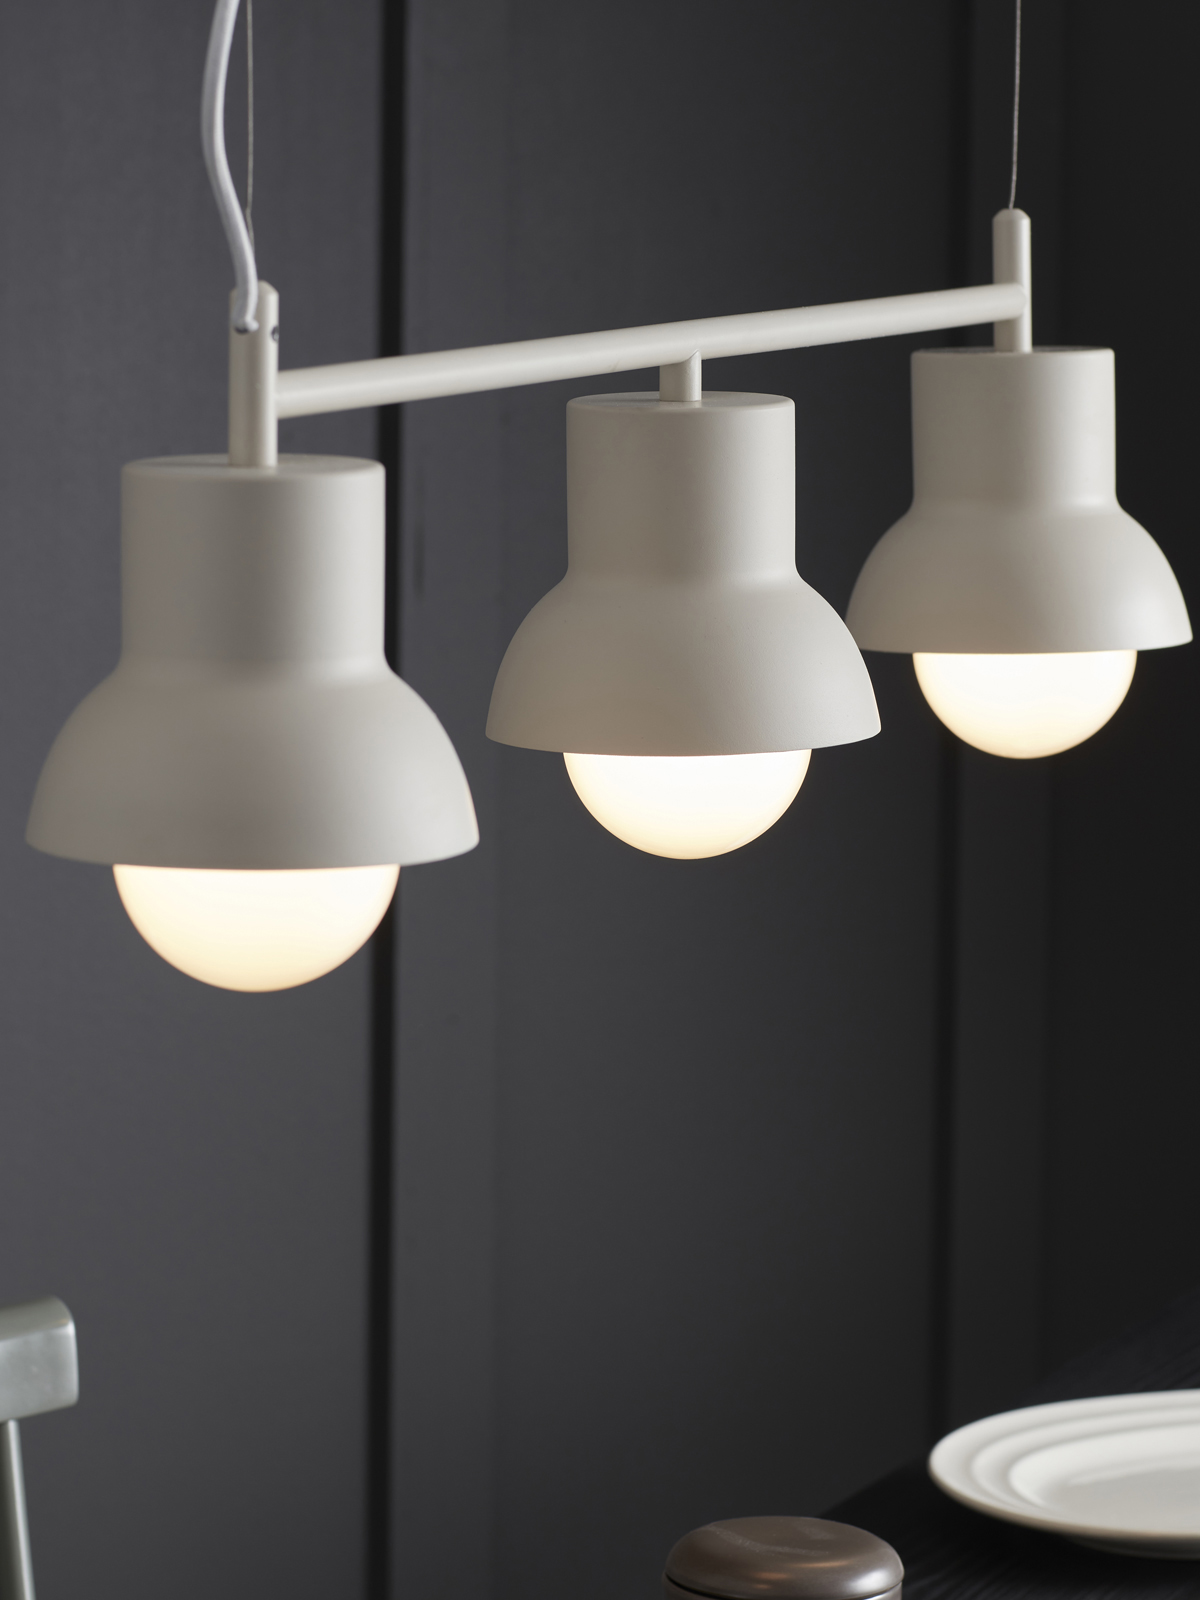 White celing lamp from Co Bankeryd designed by Odda